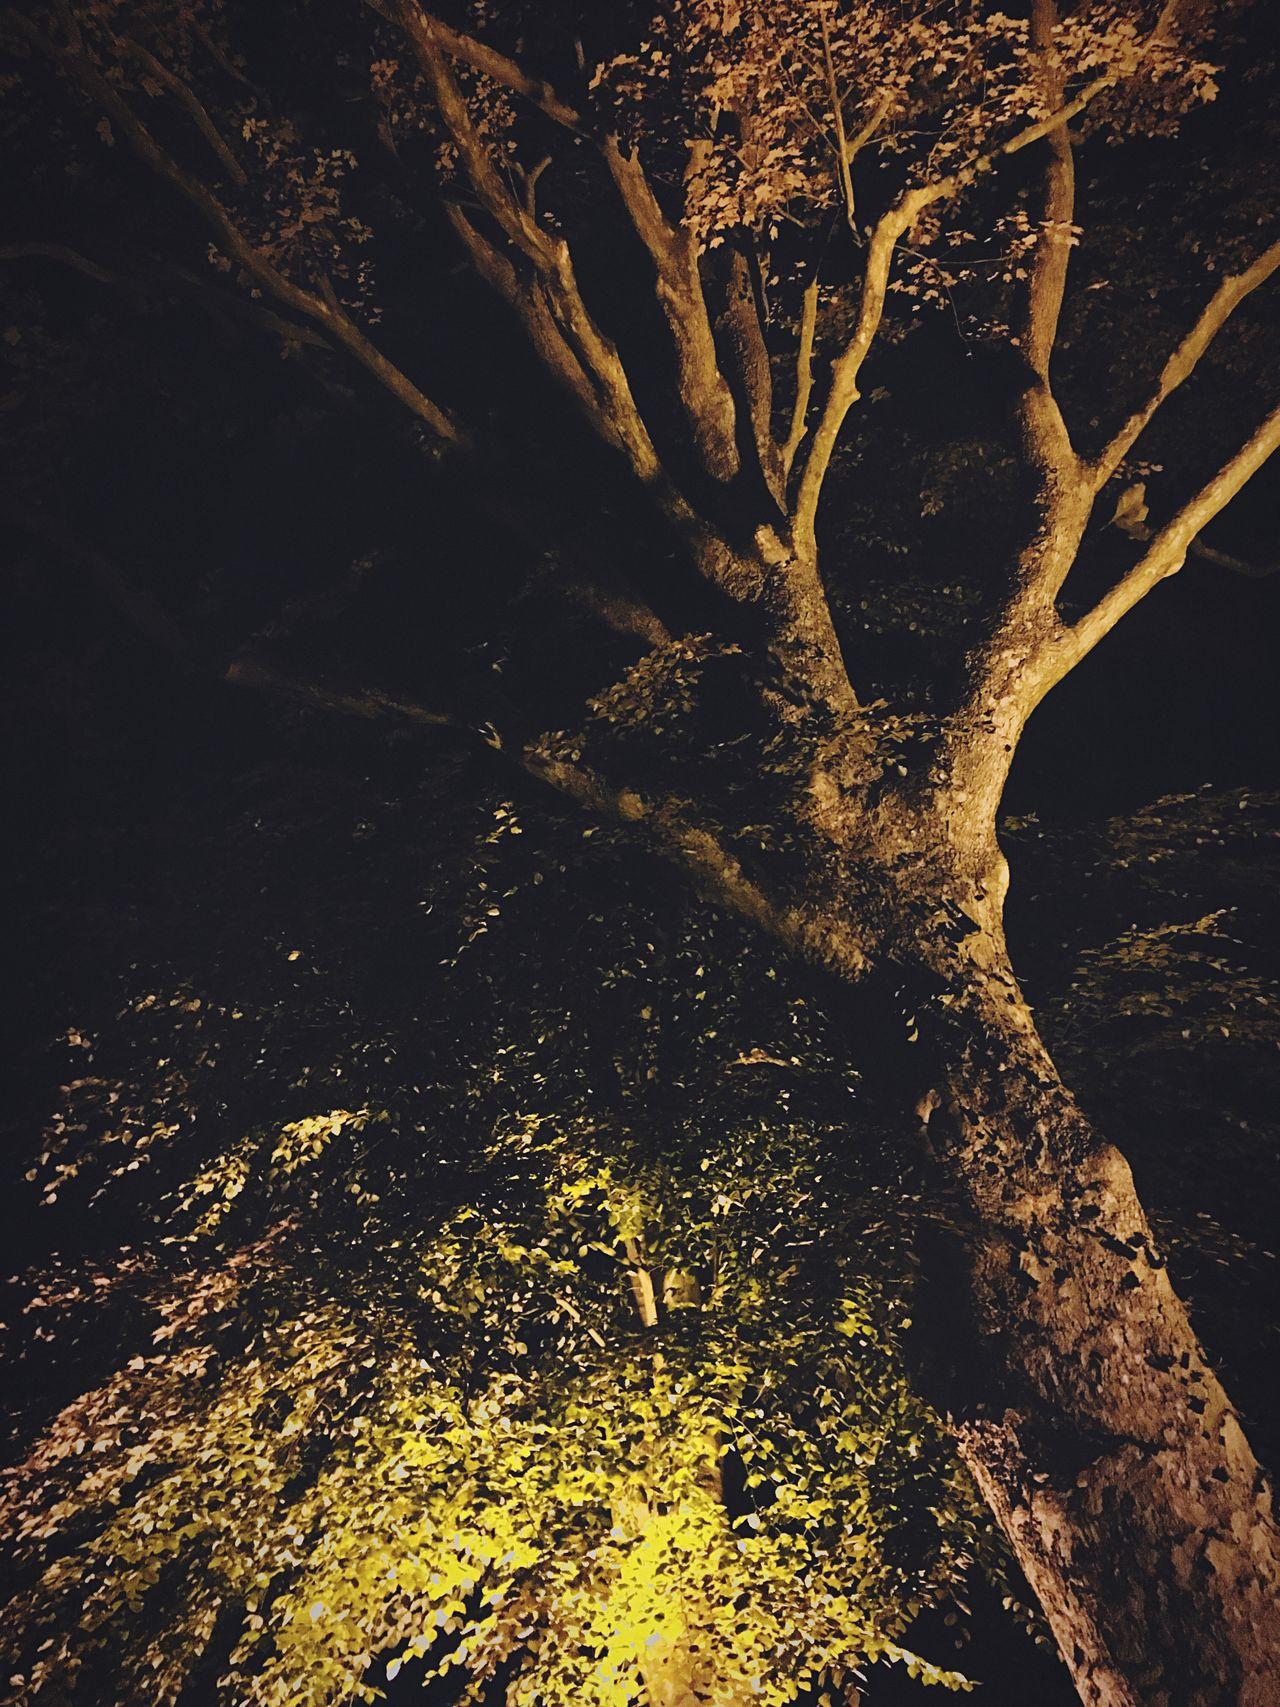 Lit Tree at Night Tree No People Nature Outdoors Tree Trunk Beauty In Nature Day Scenics Branch Close-up Night Nightphotography Night Photography Trees Lit Illuminated Illumination